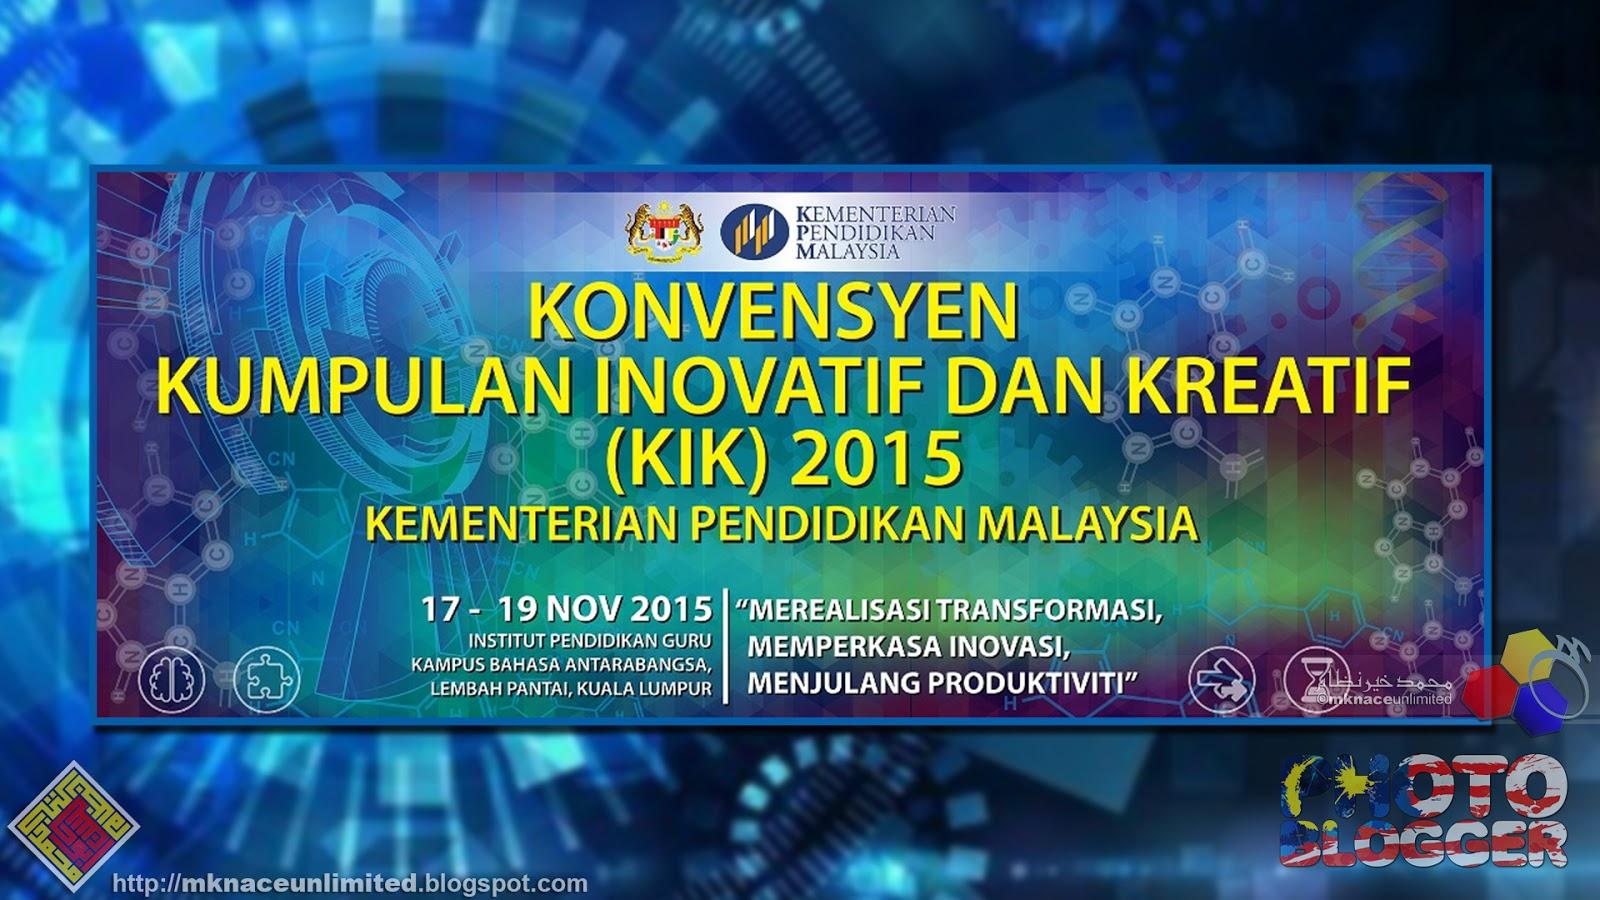 Konvensyen Kumpulan Inovatif Dan Kreatif Kik Kpm 2015 Mknace Roti Tissue By Canai Ikhwan Gh Corner Mks